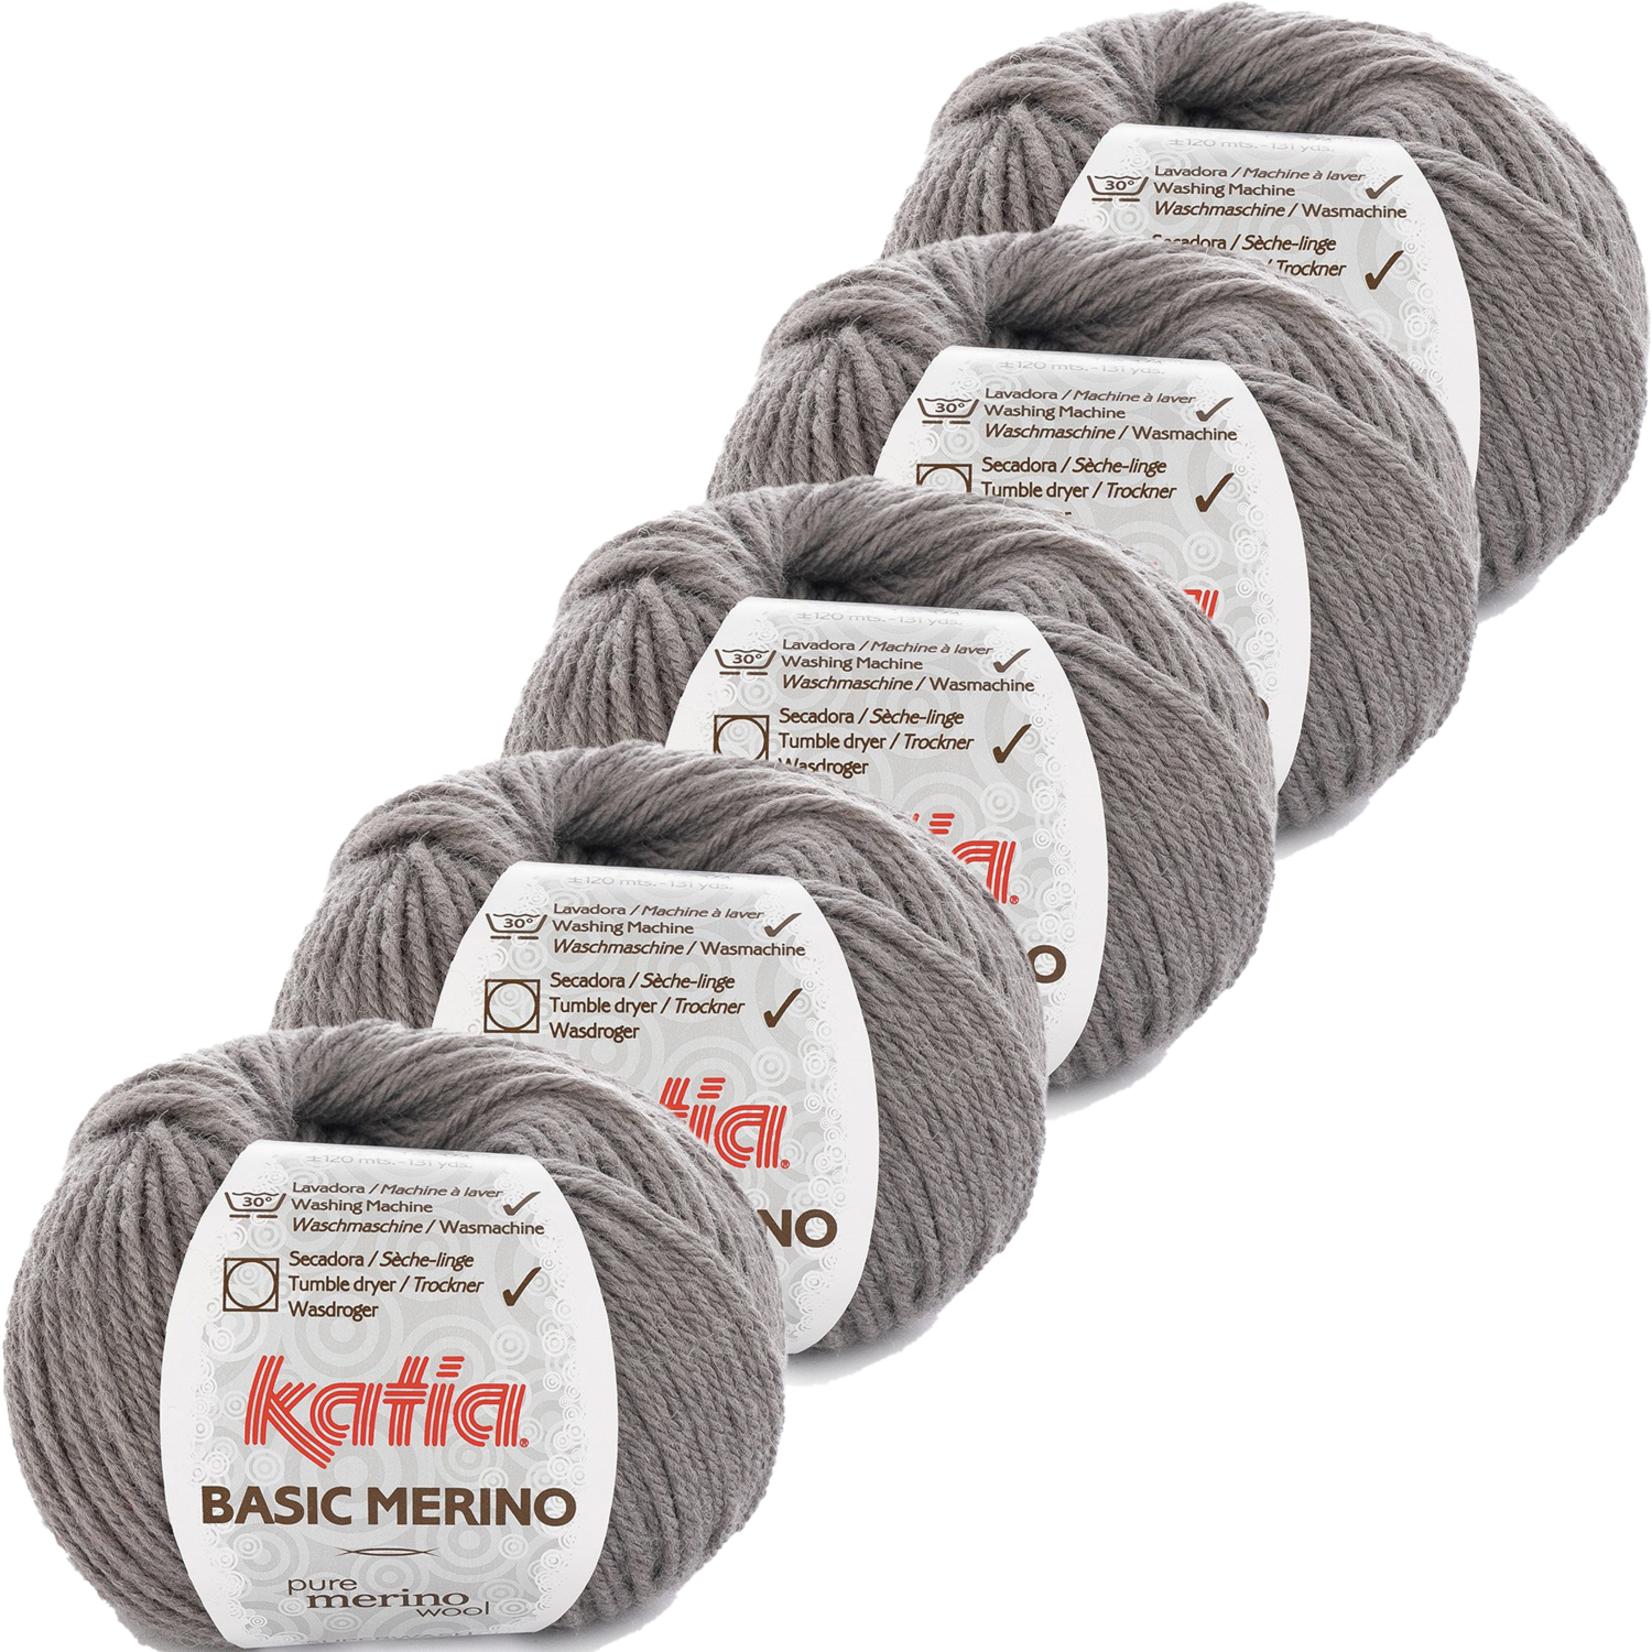 Katia Basic Merino - kleur 13_Medium grijs - bundel 5 bollen 50 gr.  van 120 m.